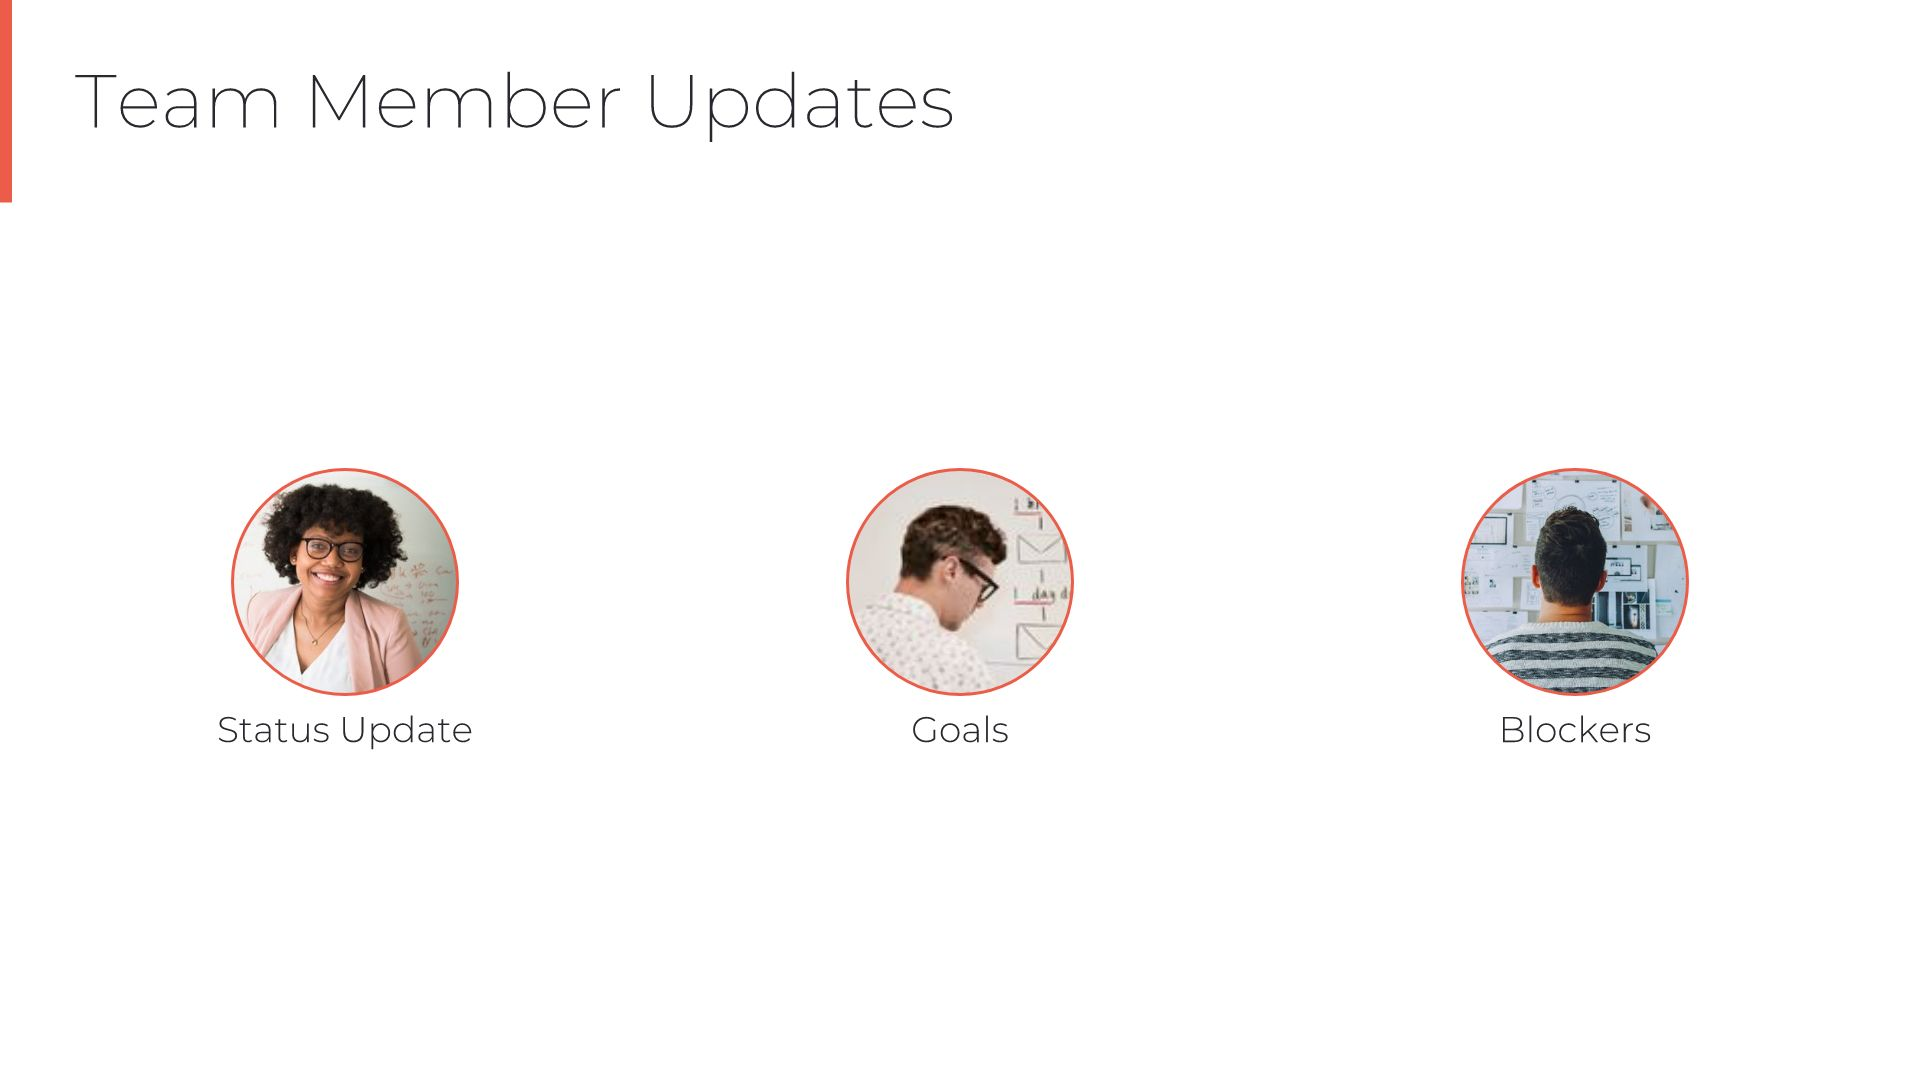 Member Updates